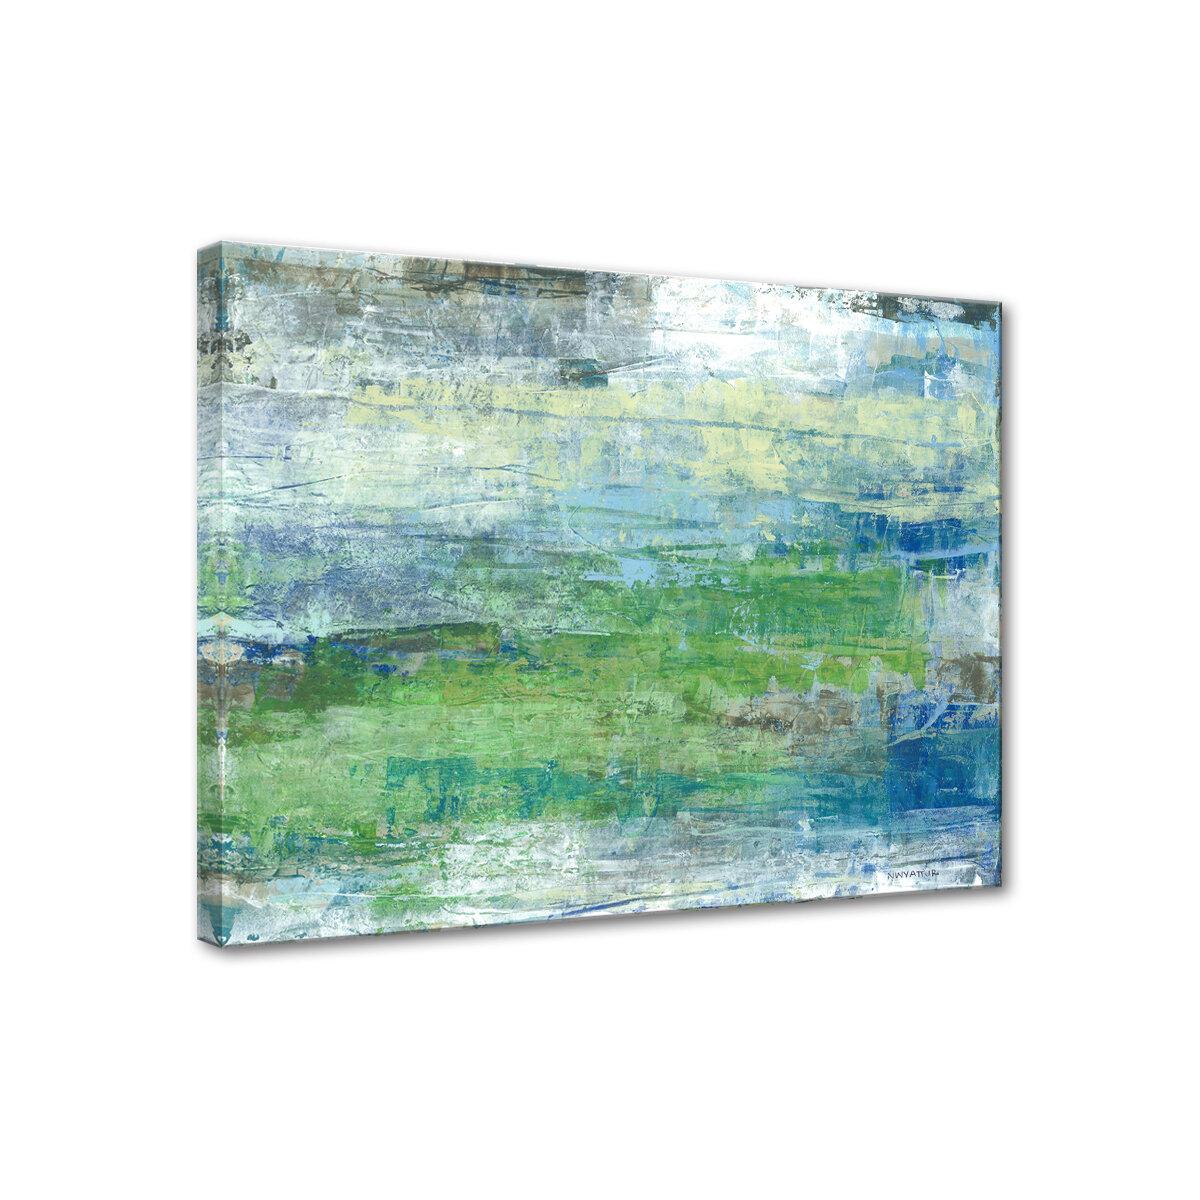 Woodland Friends II Giclee Stretched Canvas Artwork 22 x 28 Global Gallery Farida Zaman